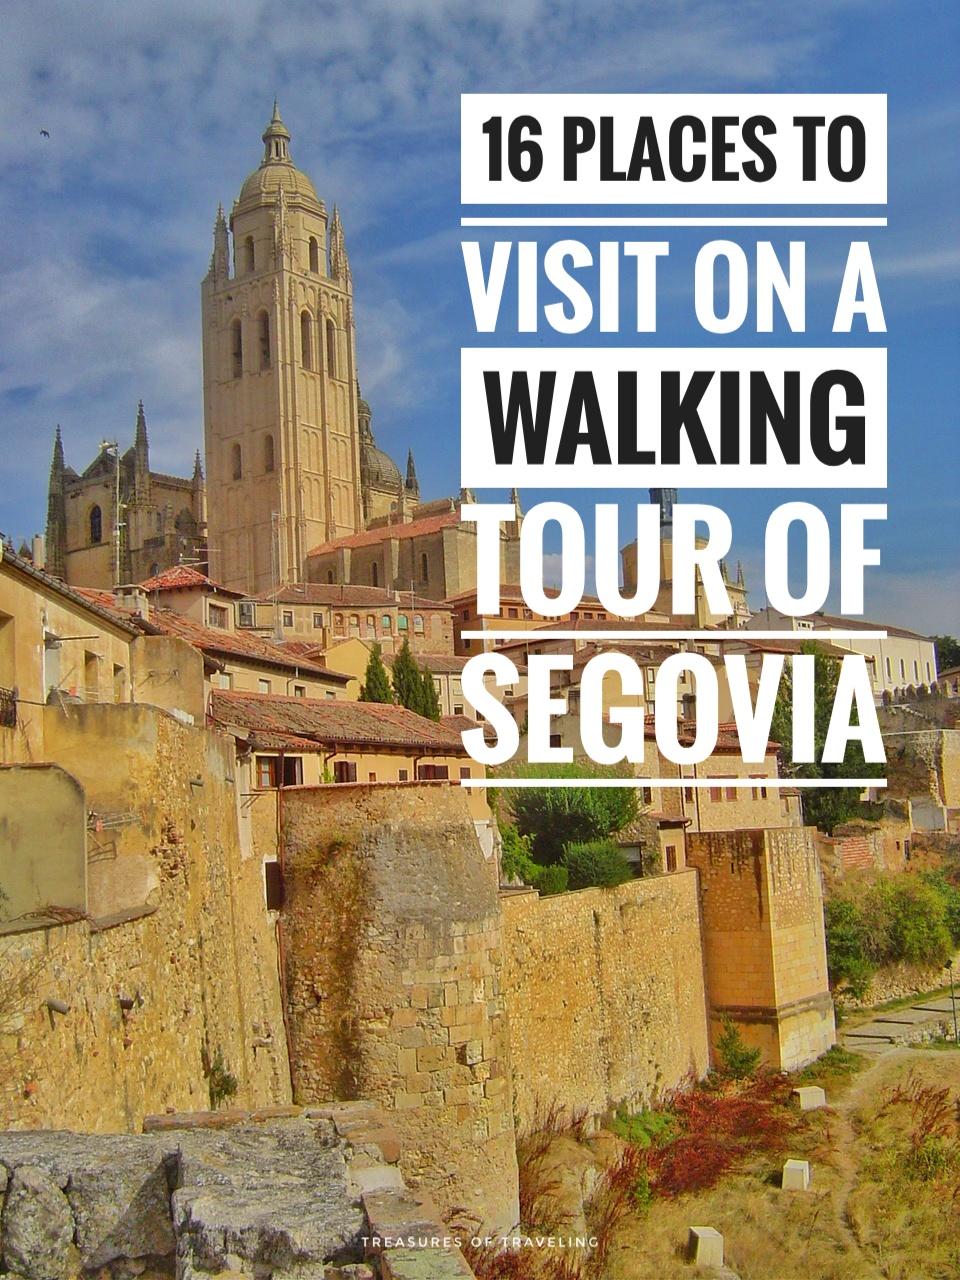 16 Places to Visit on a Walking Tour of Segovia!